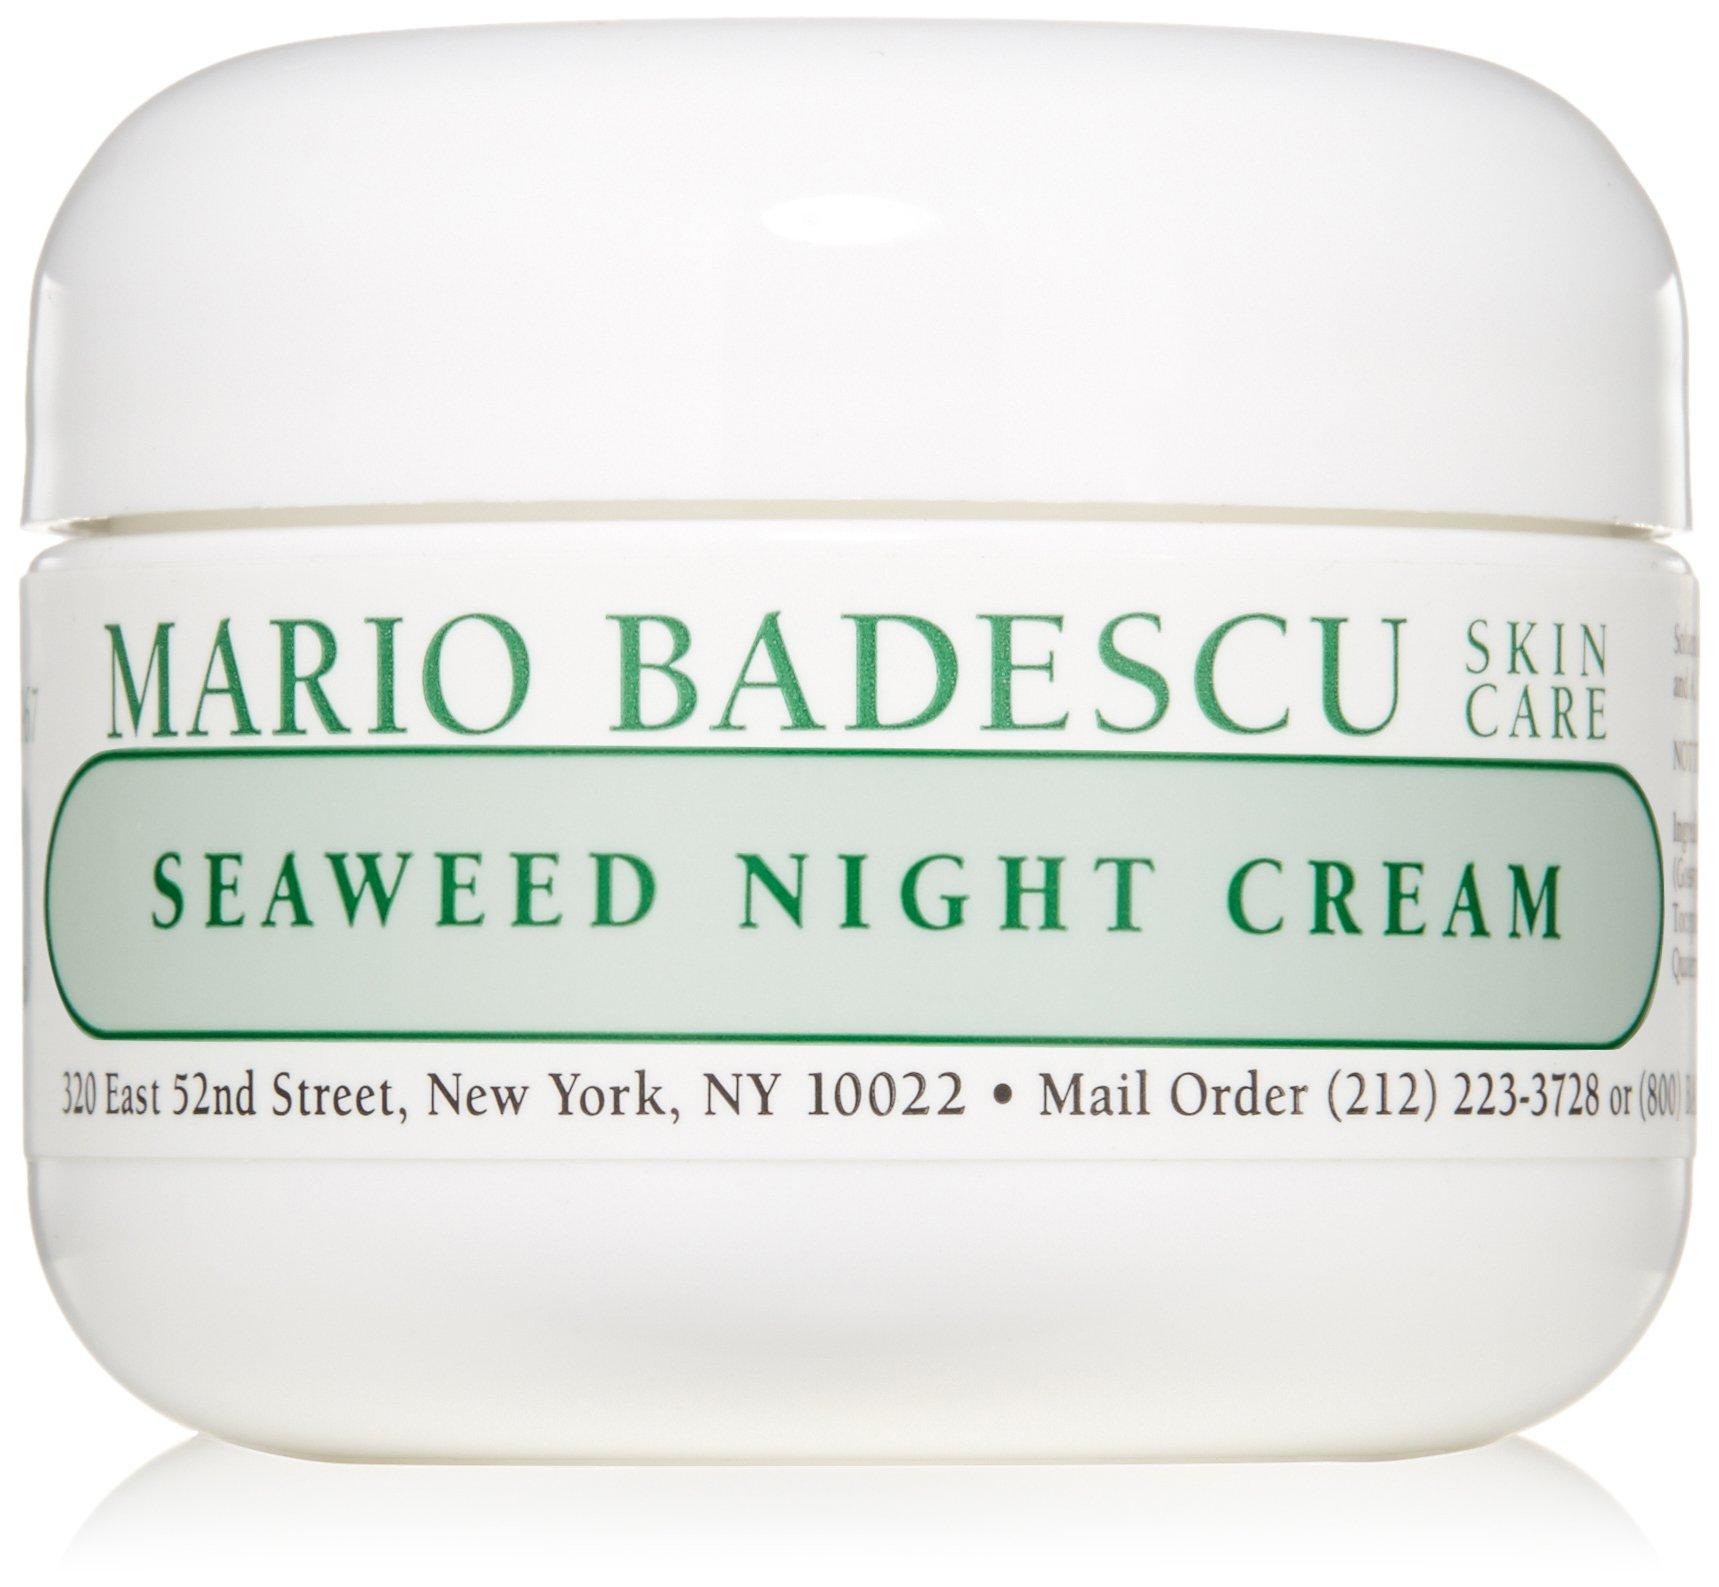 Mario Badescu Seaweed Night Cream, 1 oz